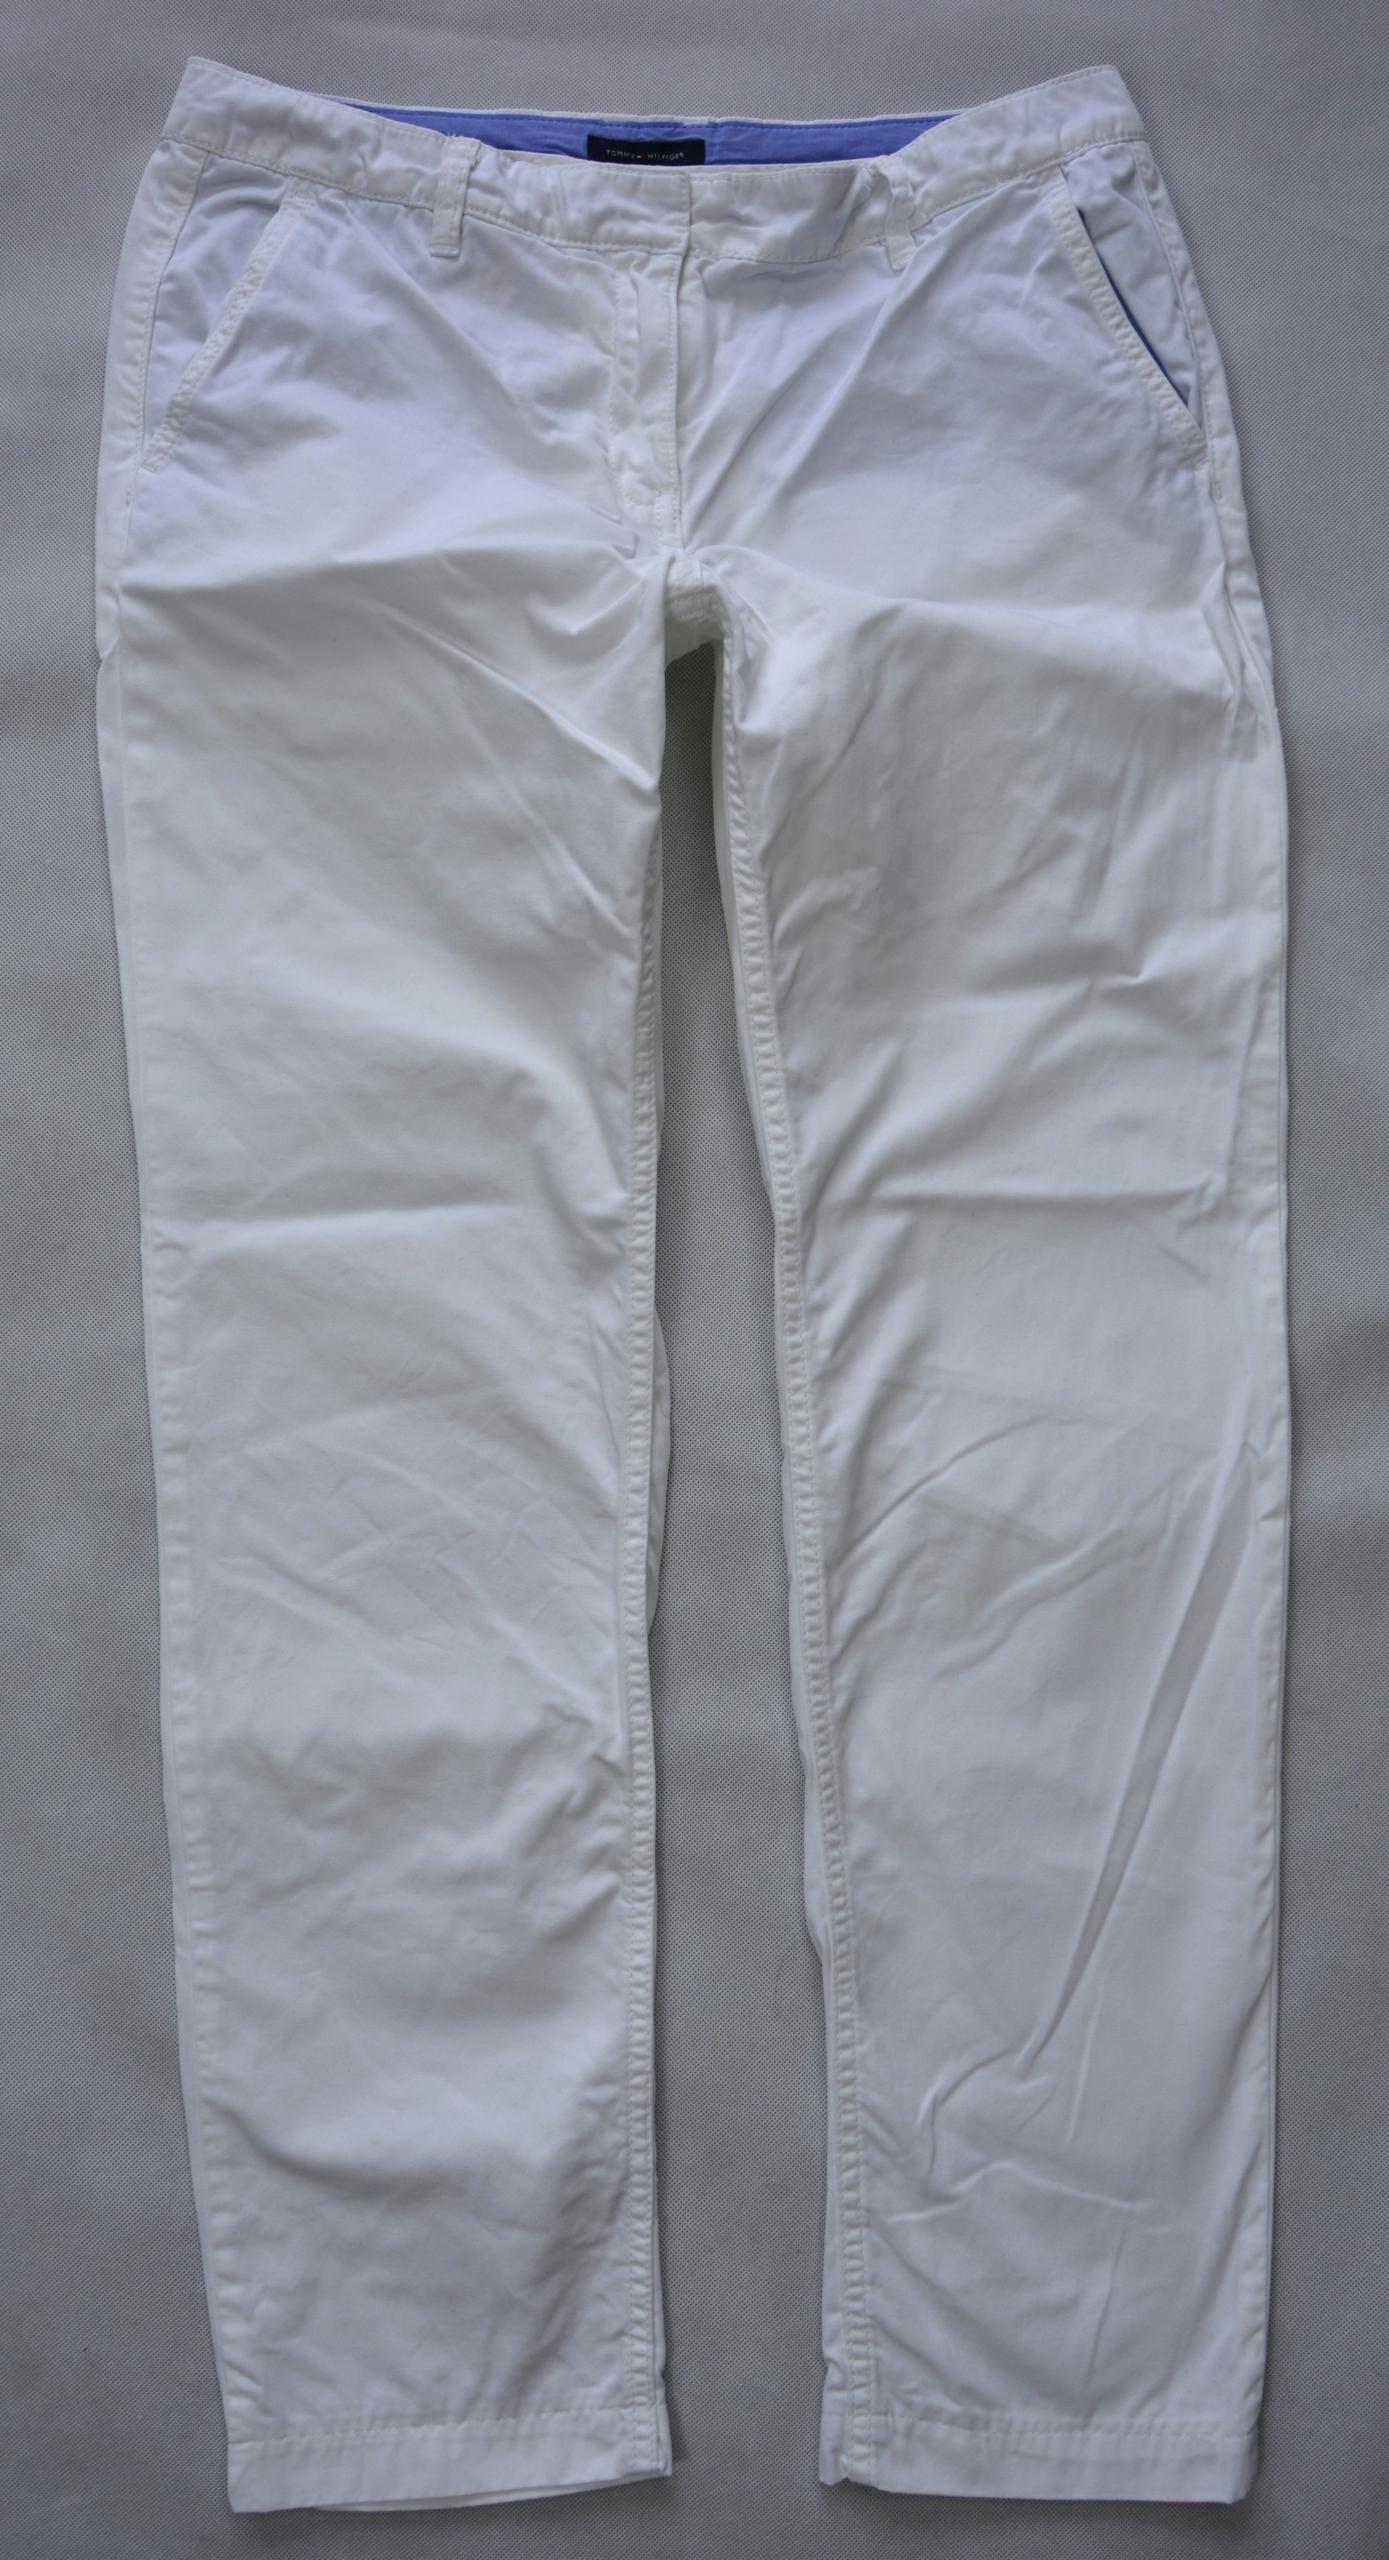 Spodnie Damskie Tommy Hilfiger roz.8 USA 40 (M) EU